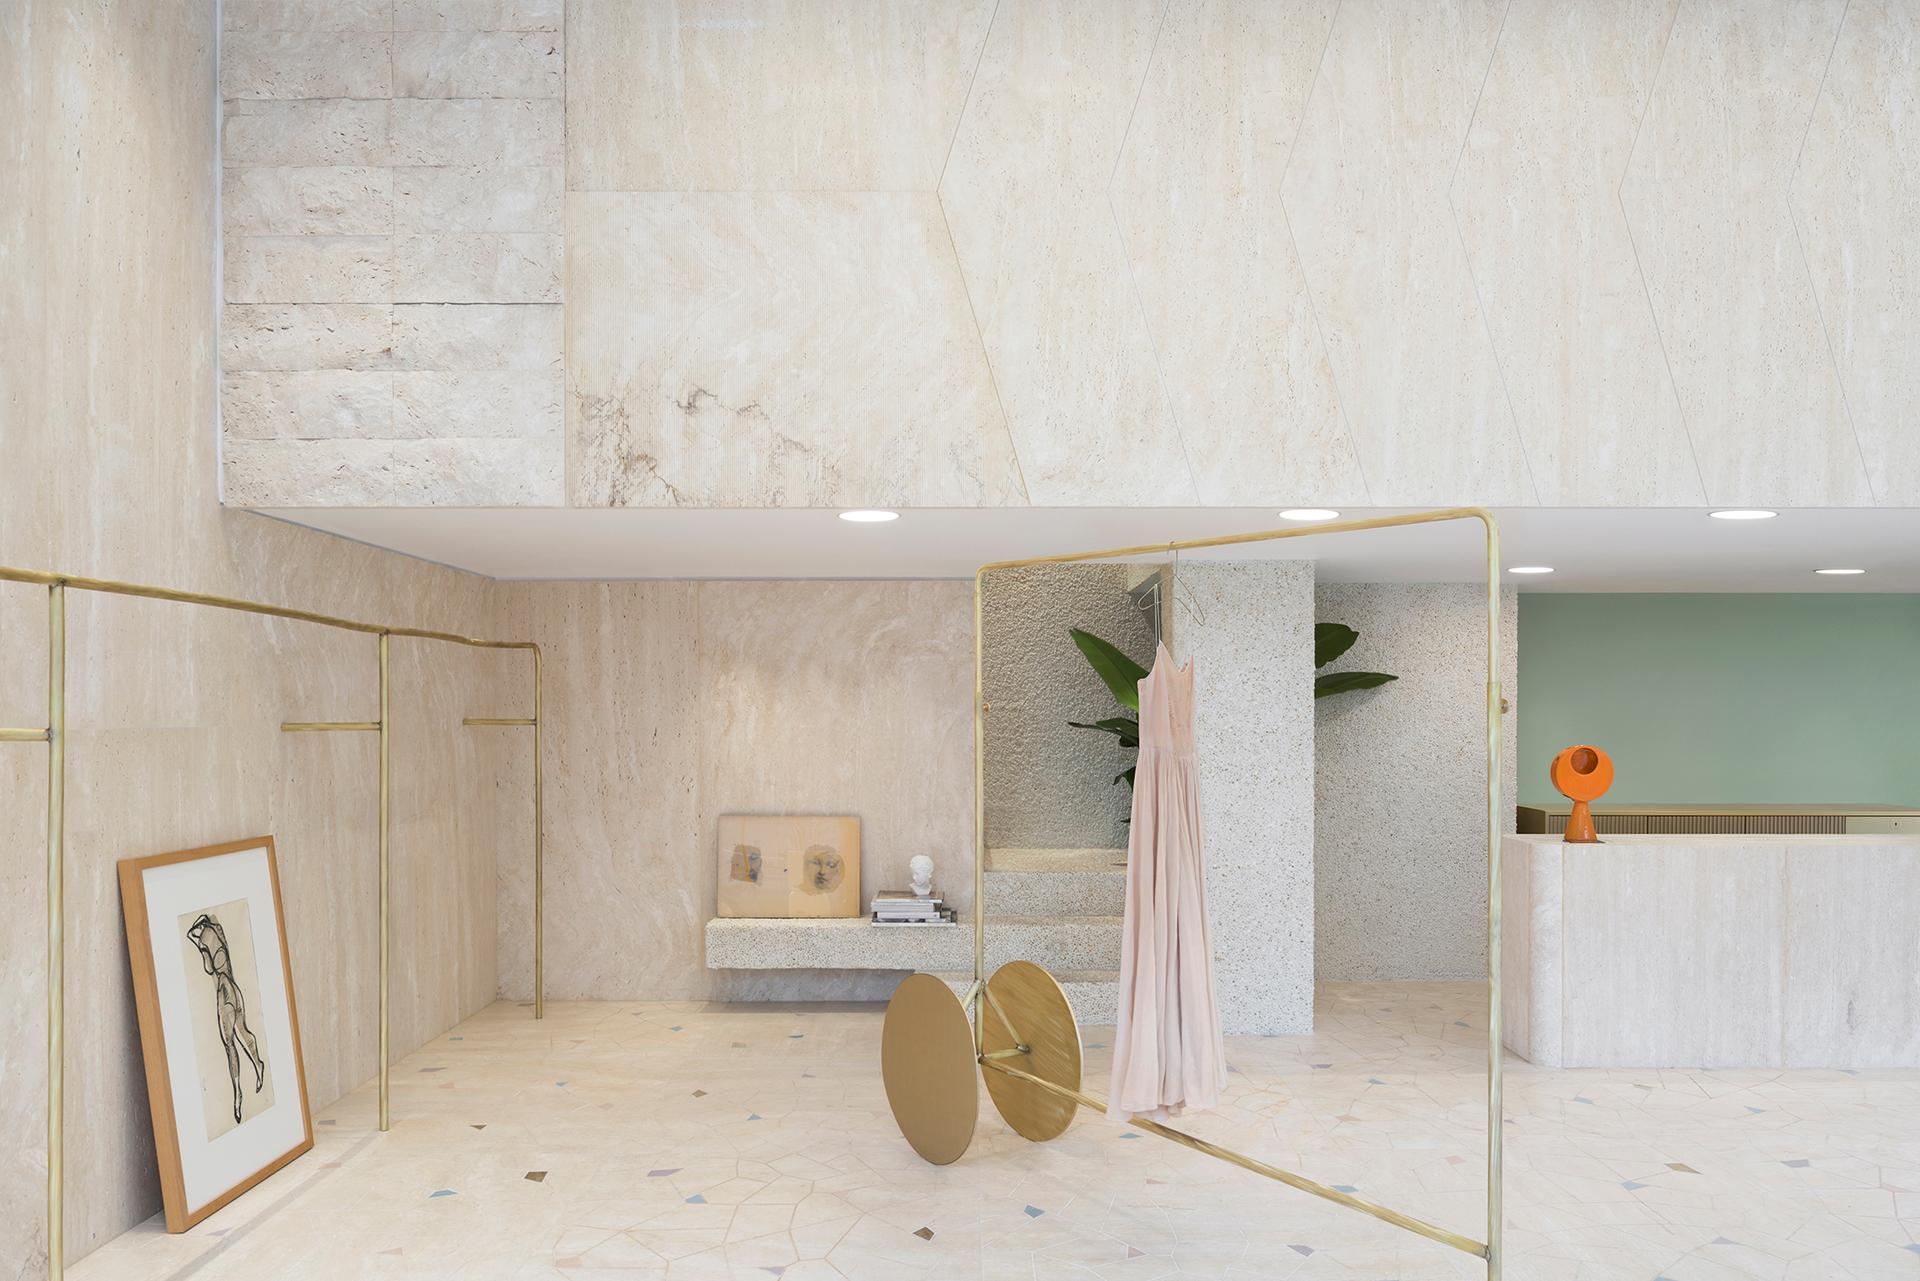 06-CODE-STUDIO_tiendas_interiorismos_Forte_Forte_Milan_Robert_Vattilana_blog